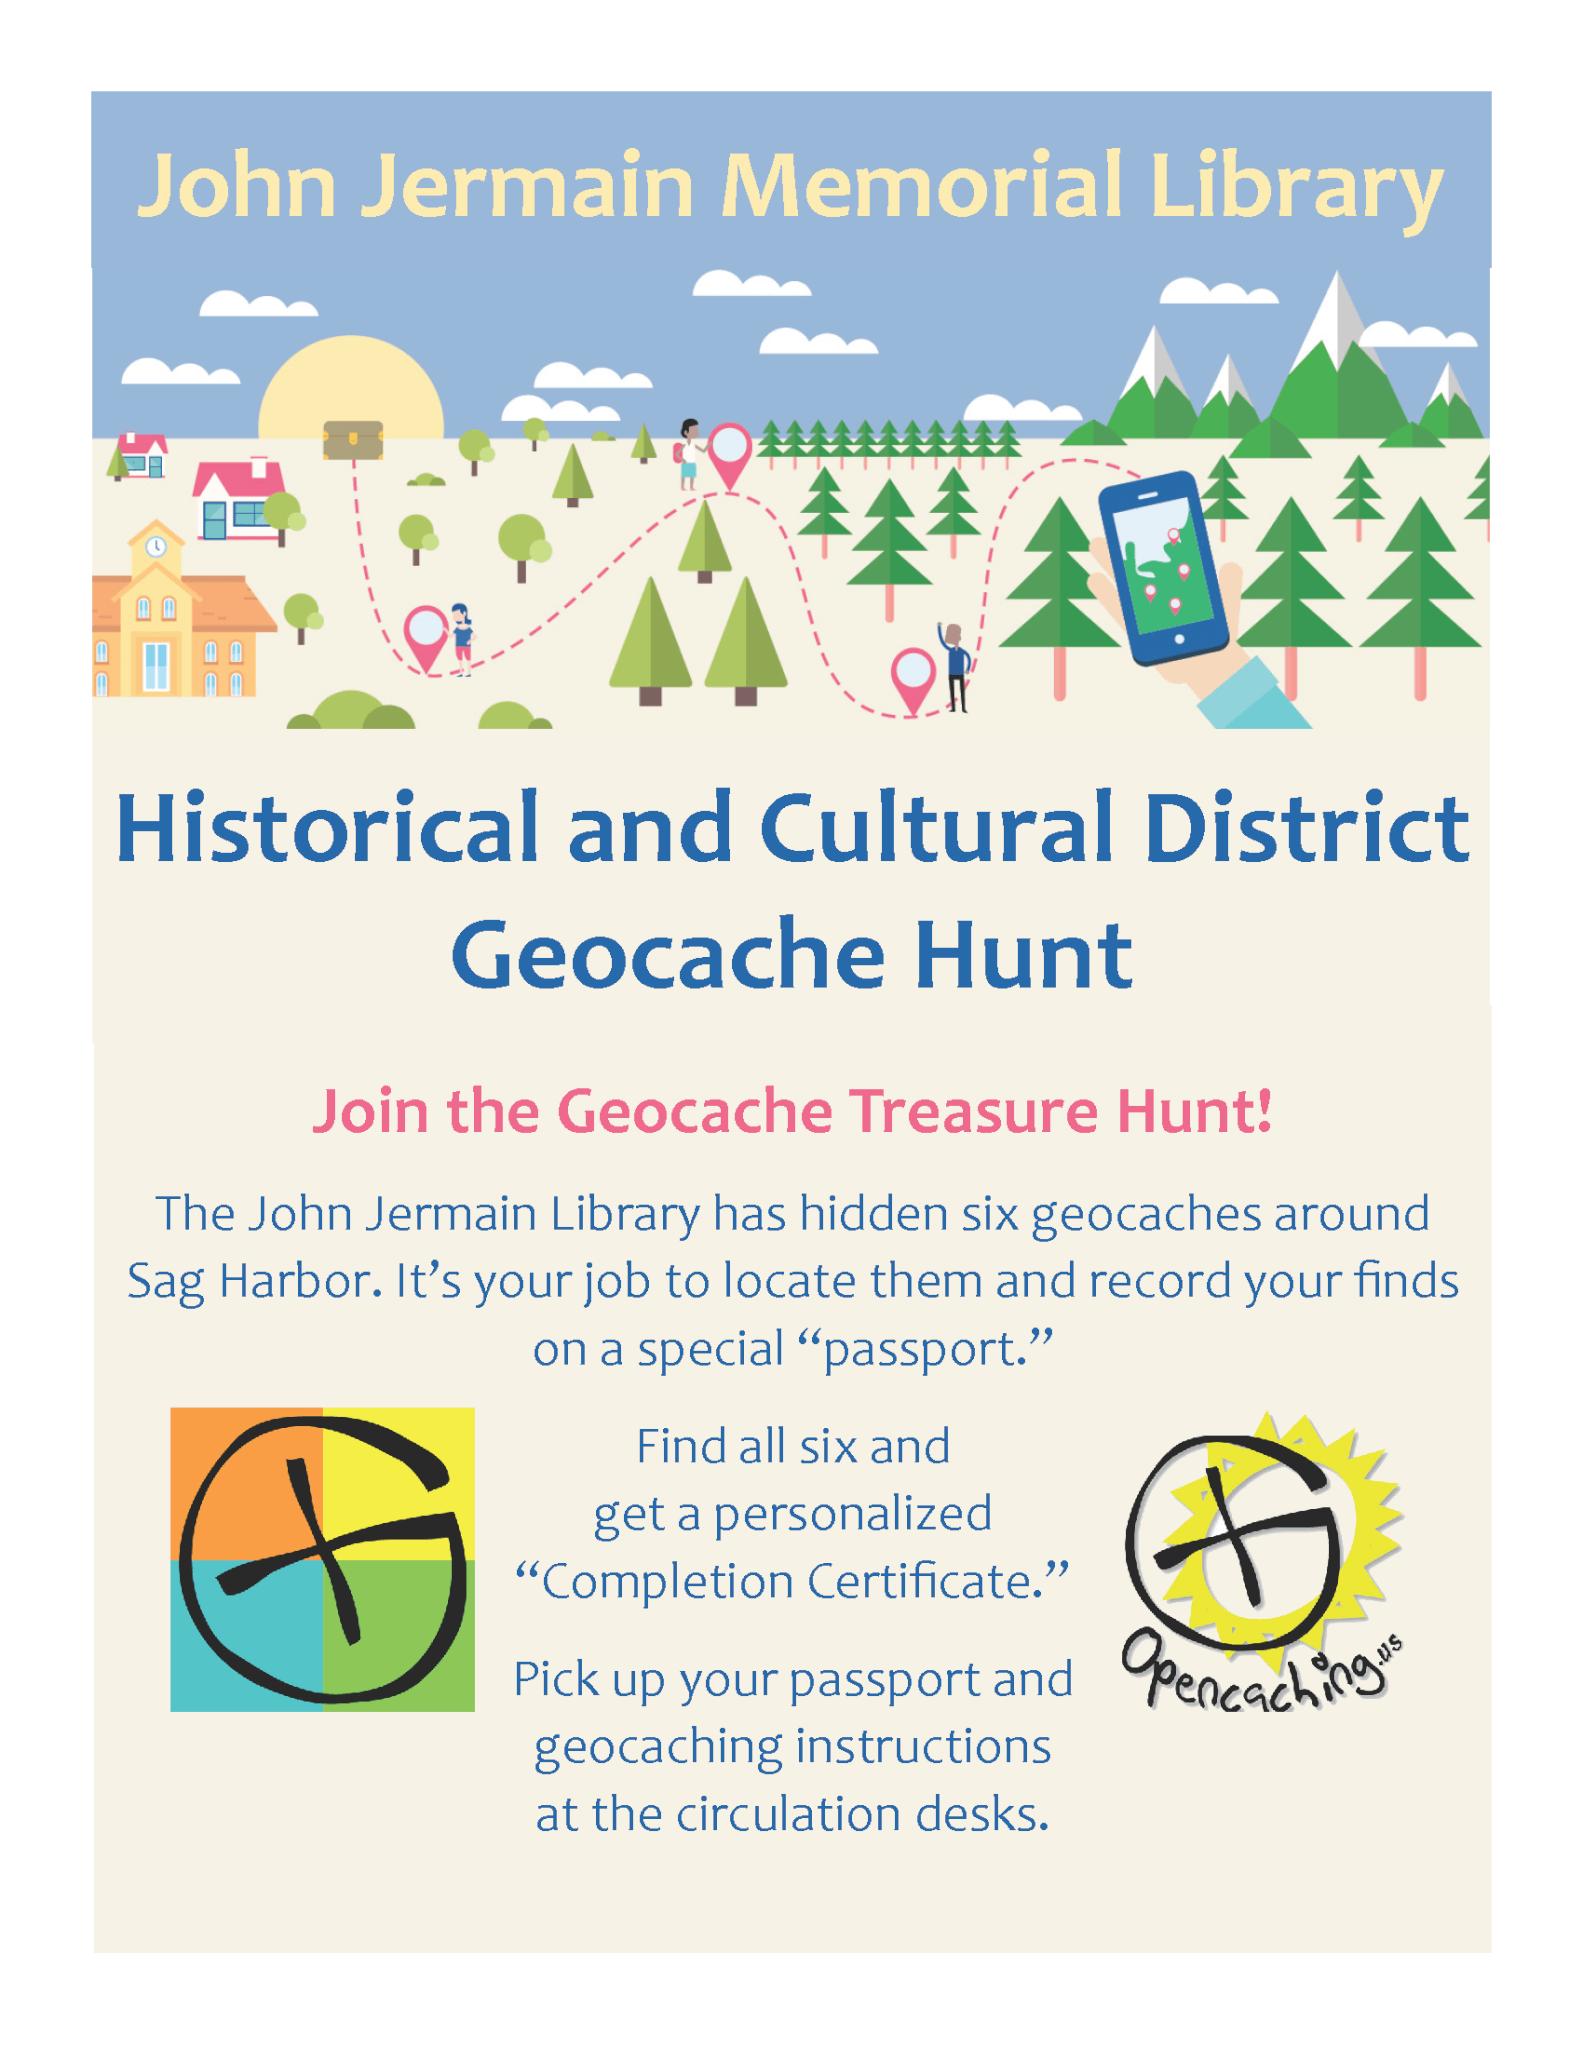 John Jermain Historical and Cutlural Distriict Geocache Hunt Flyer